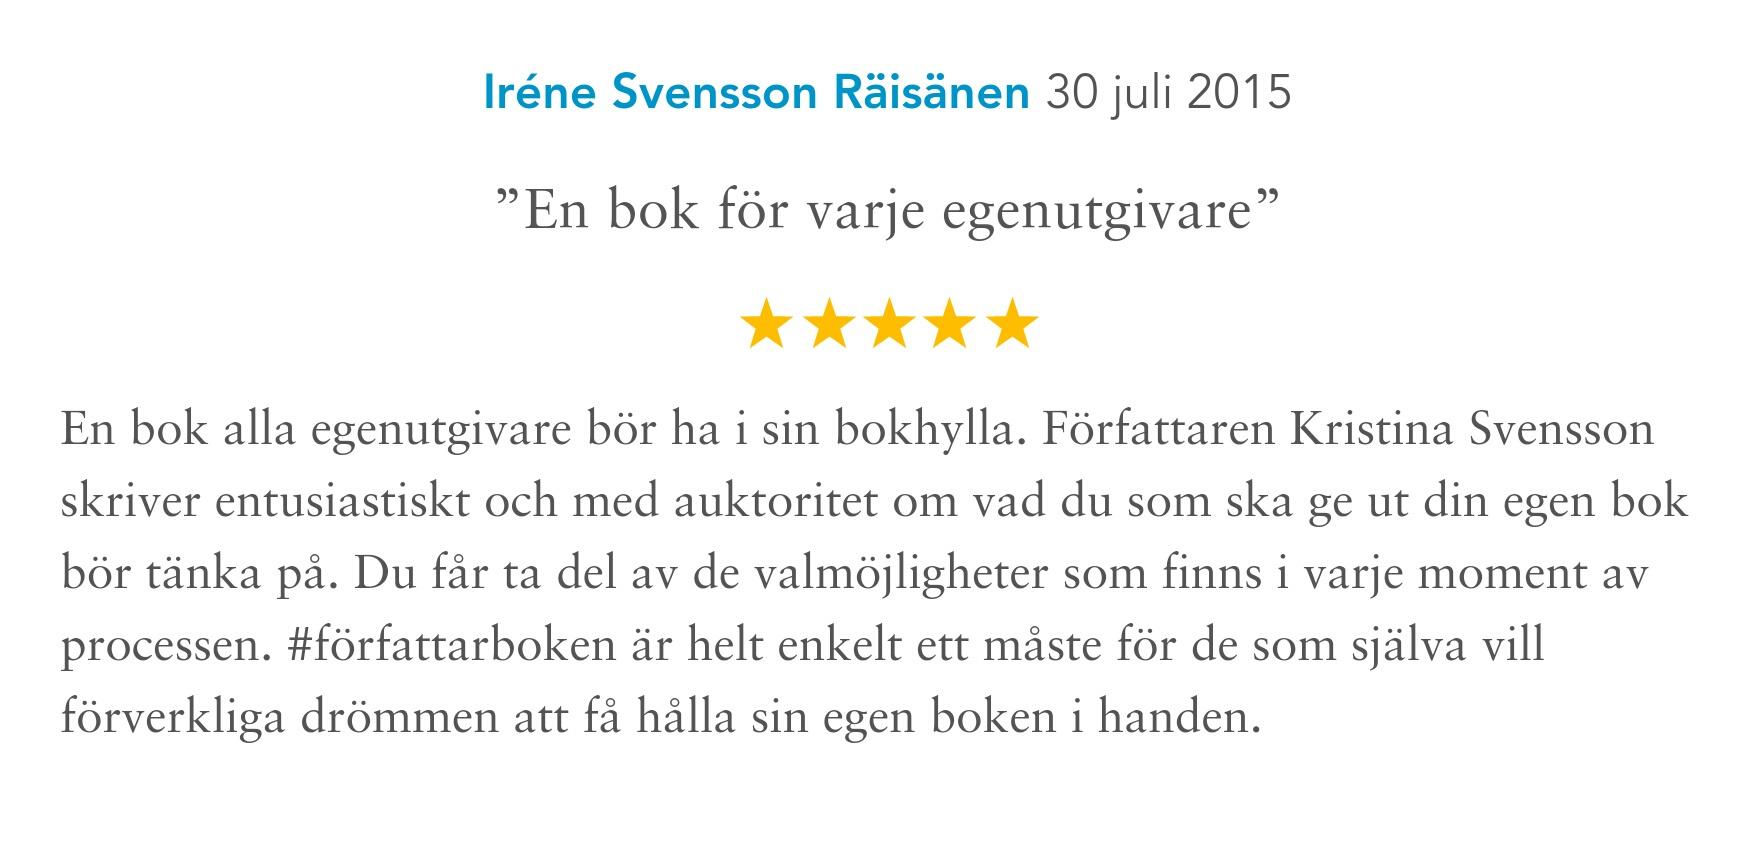 forfattarboken-bokus-kundbetyg-isr